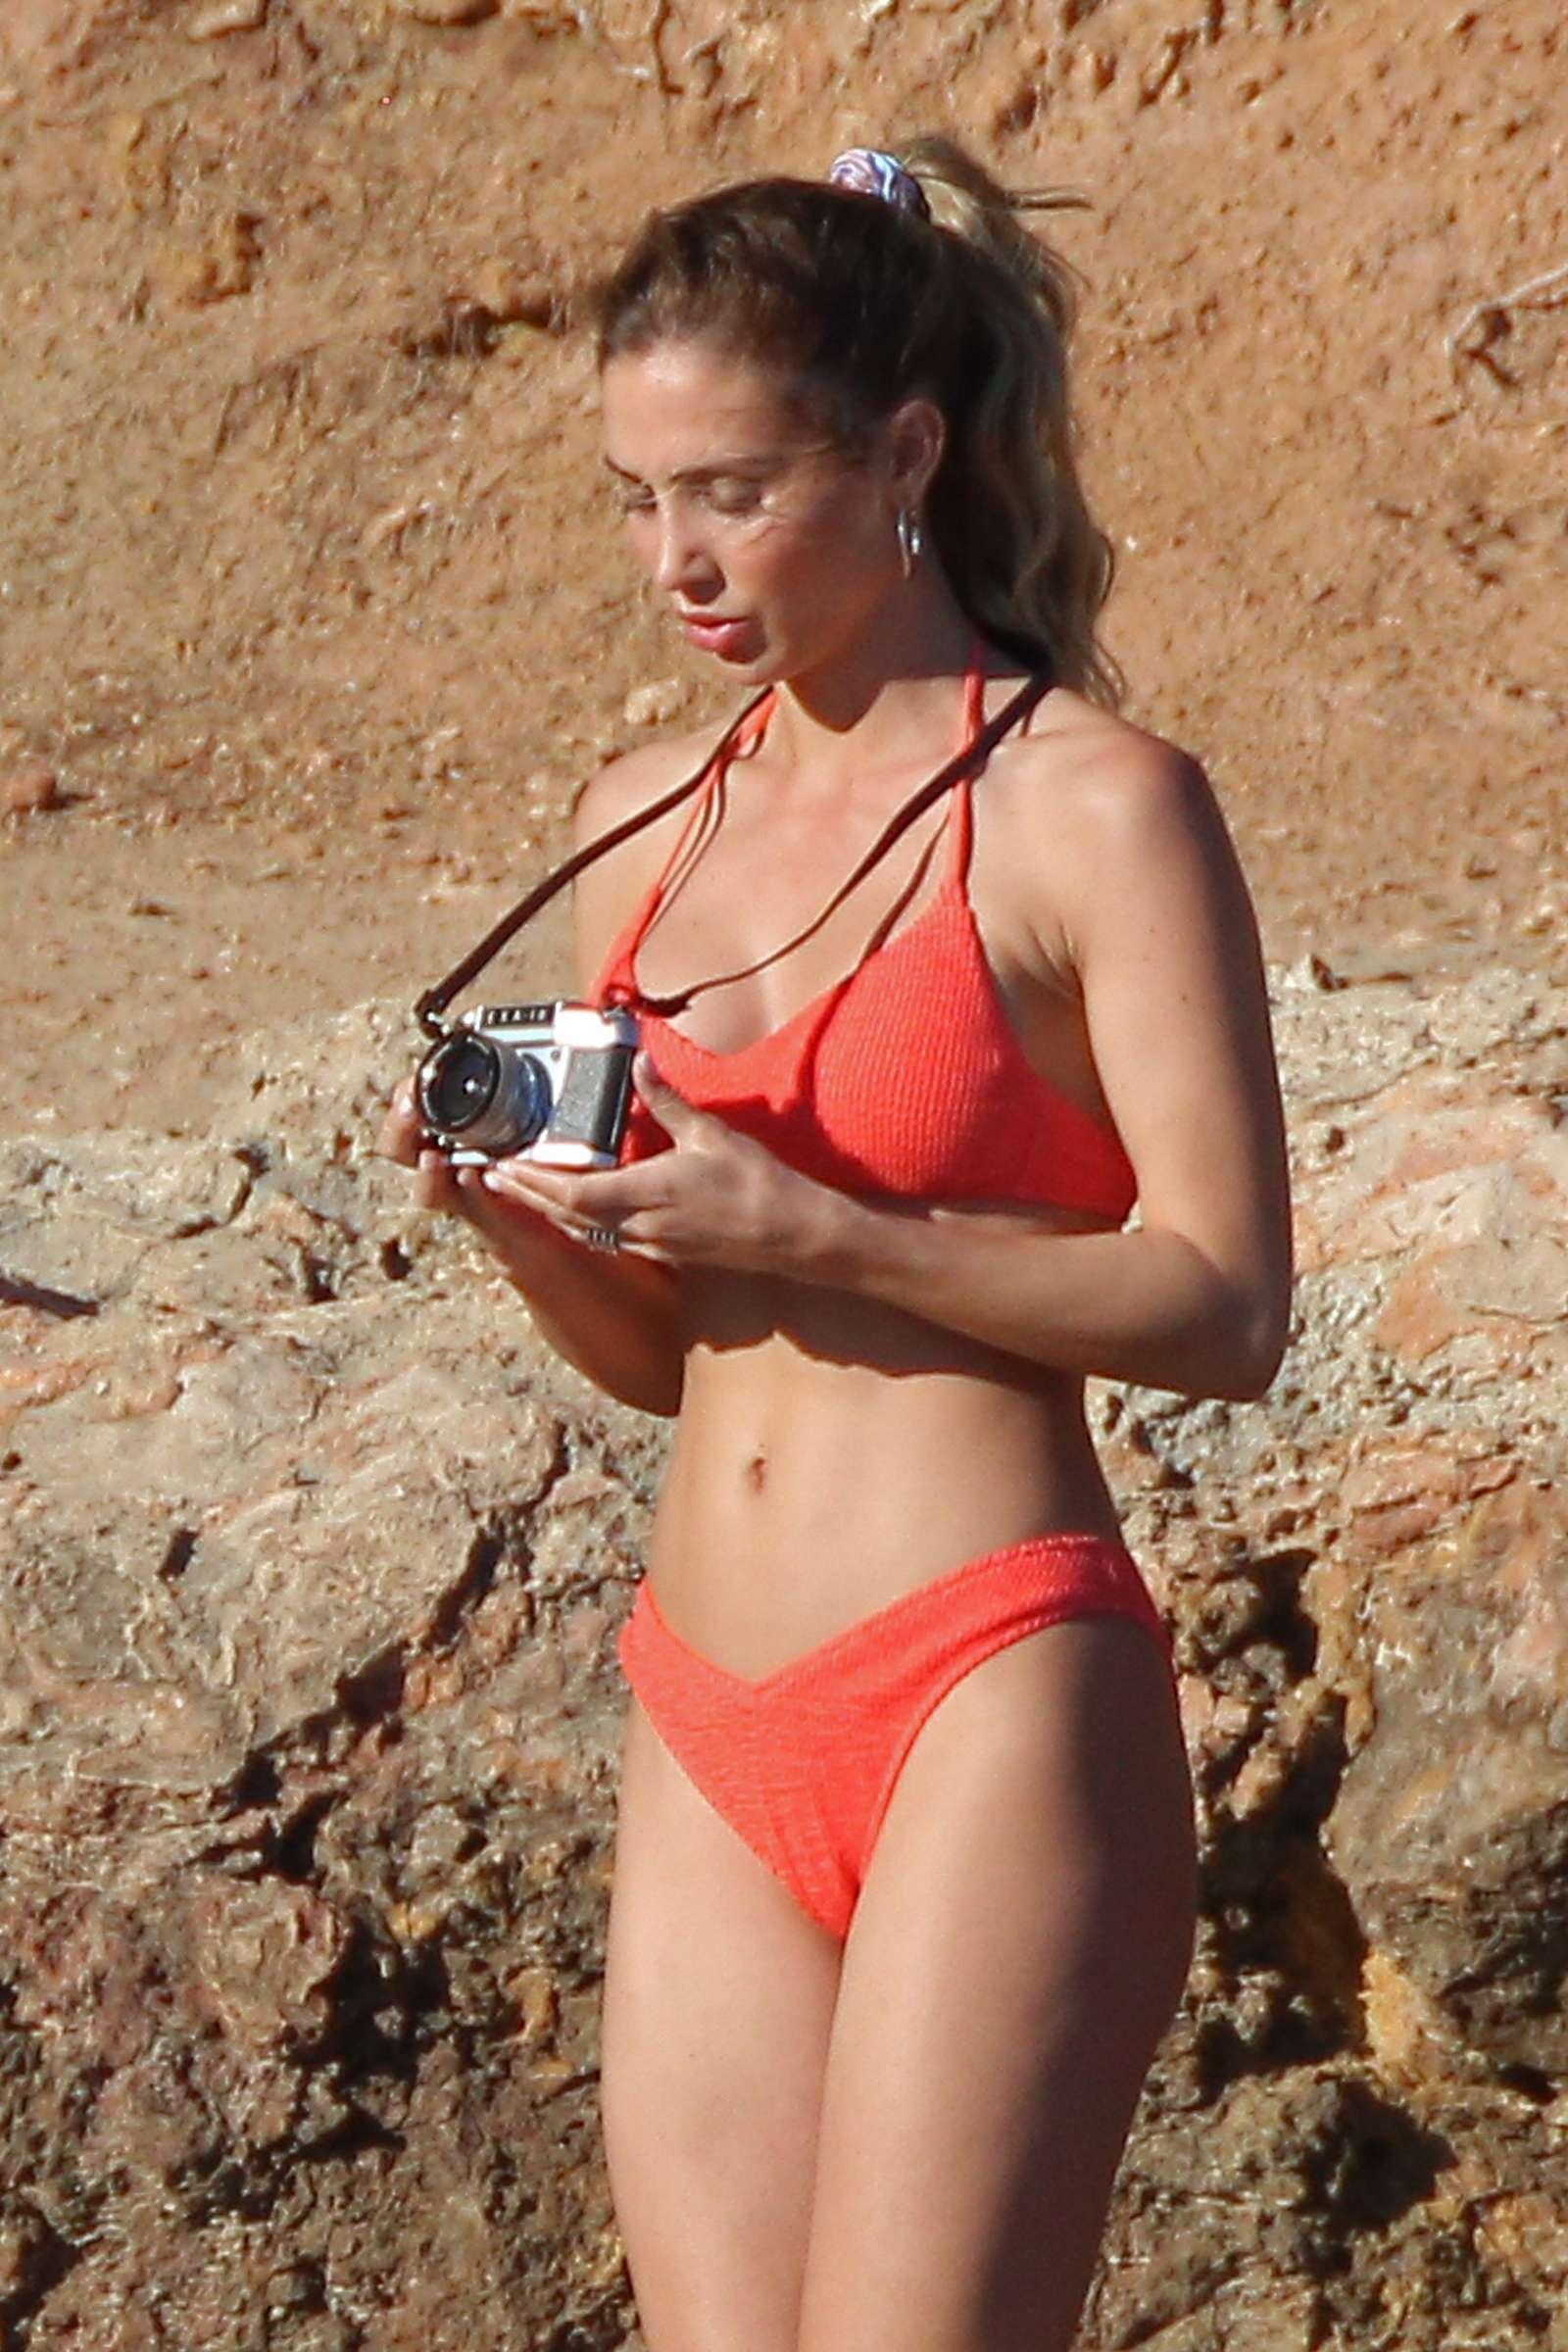 Ann-Kathrin Brommel in Bikini on a photoshoot in Ibiza